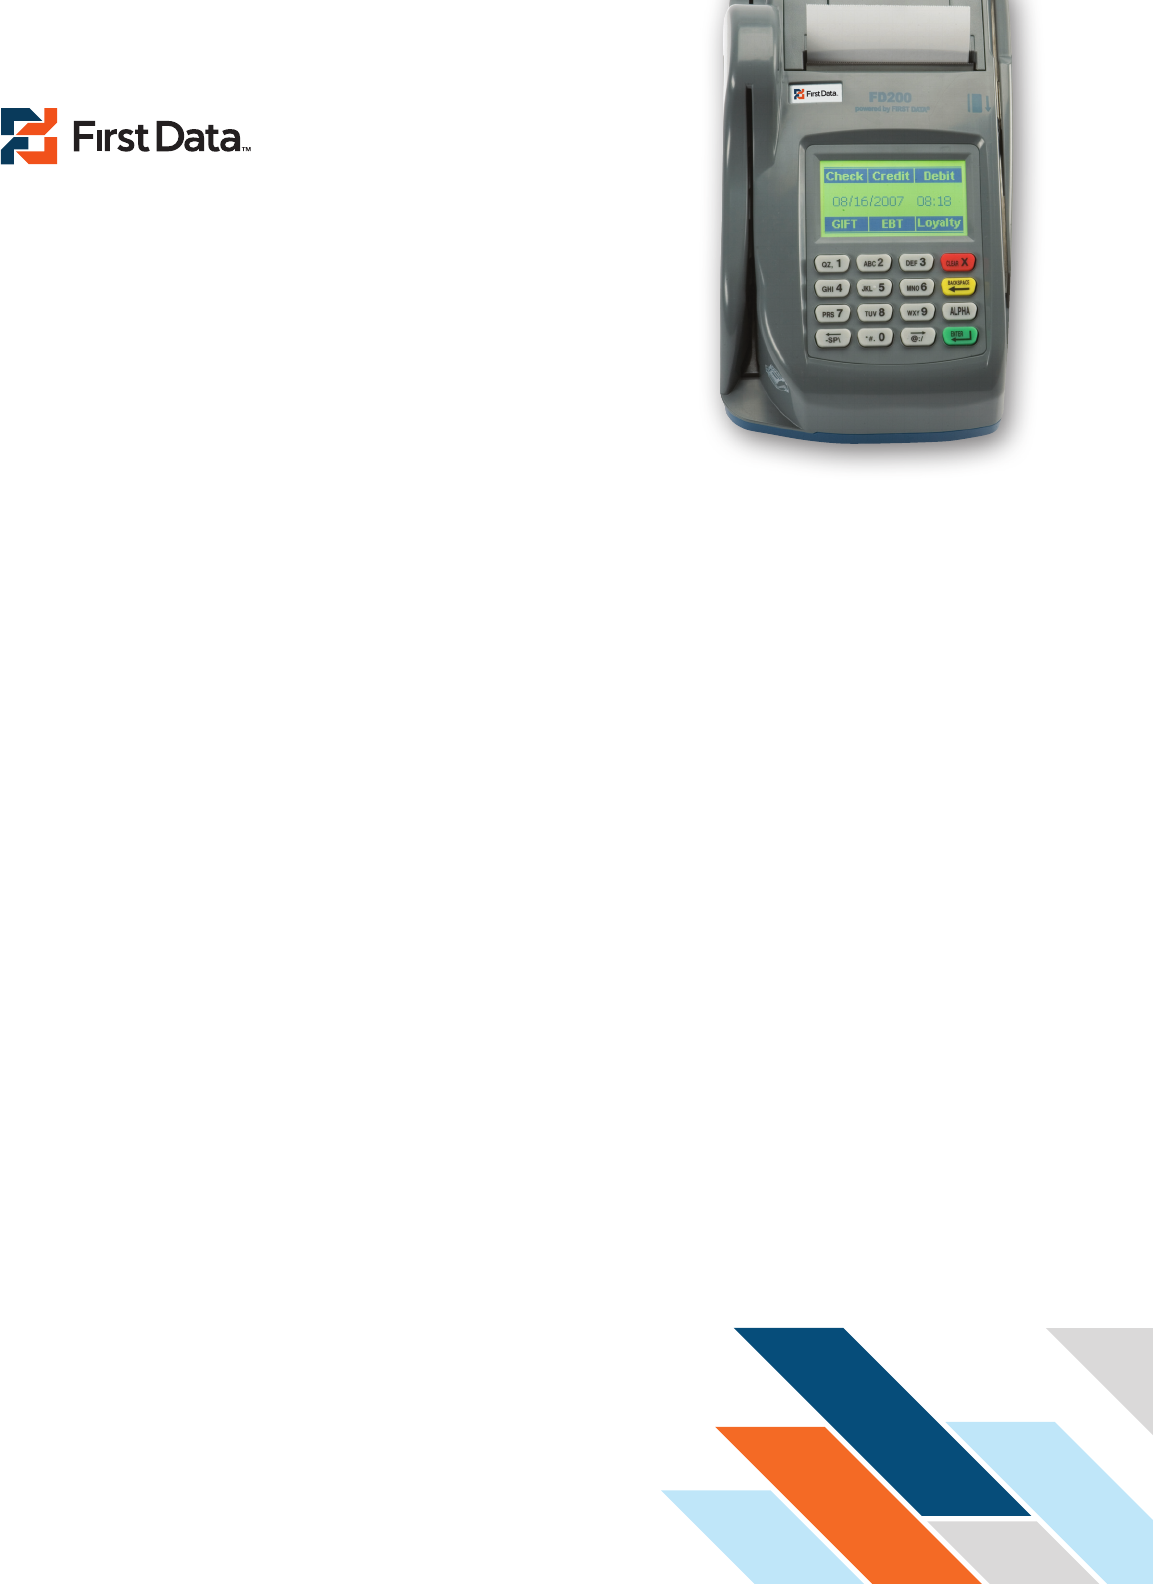 First Data FD200 Credit Card Terminal Fact Sheet